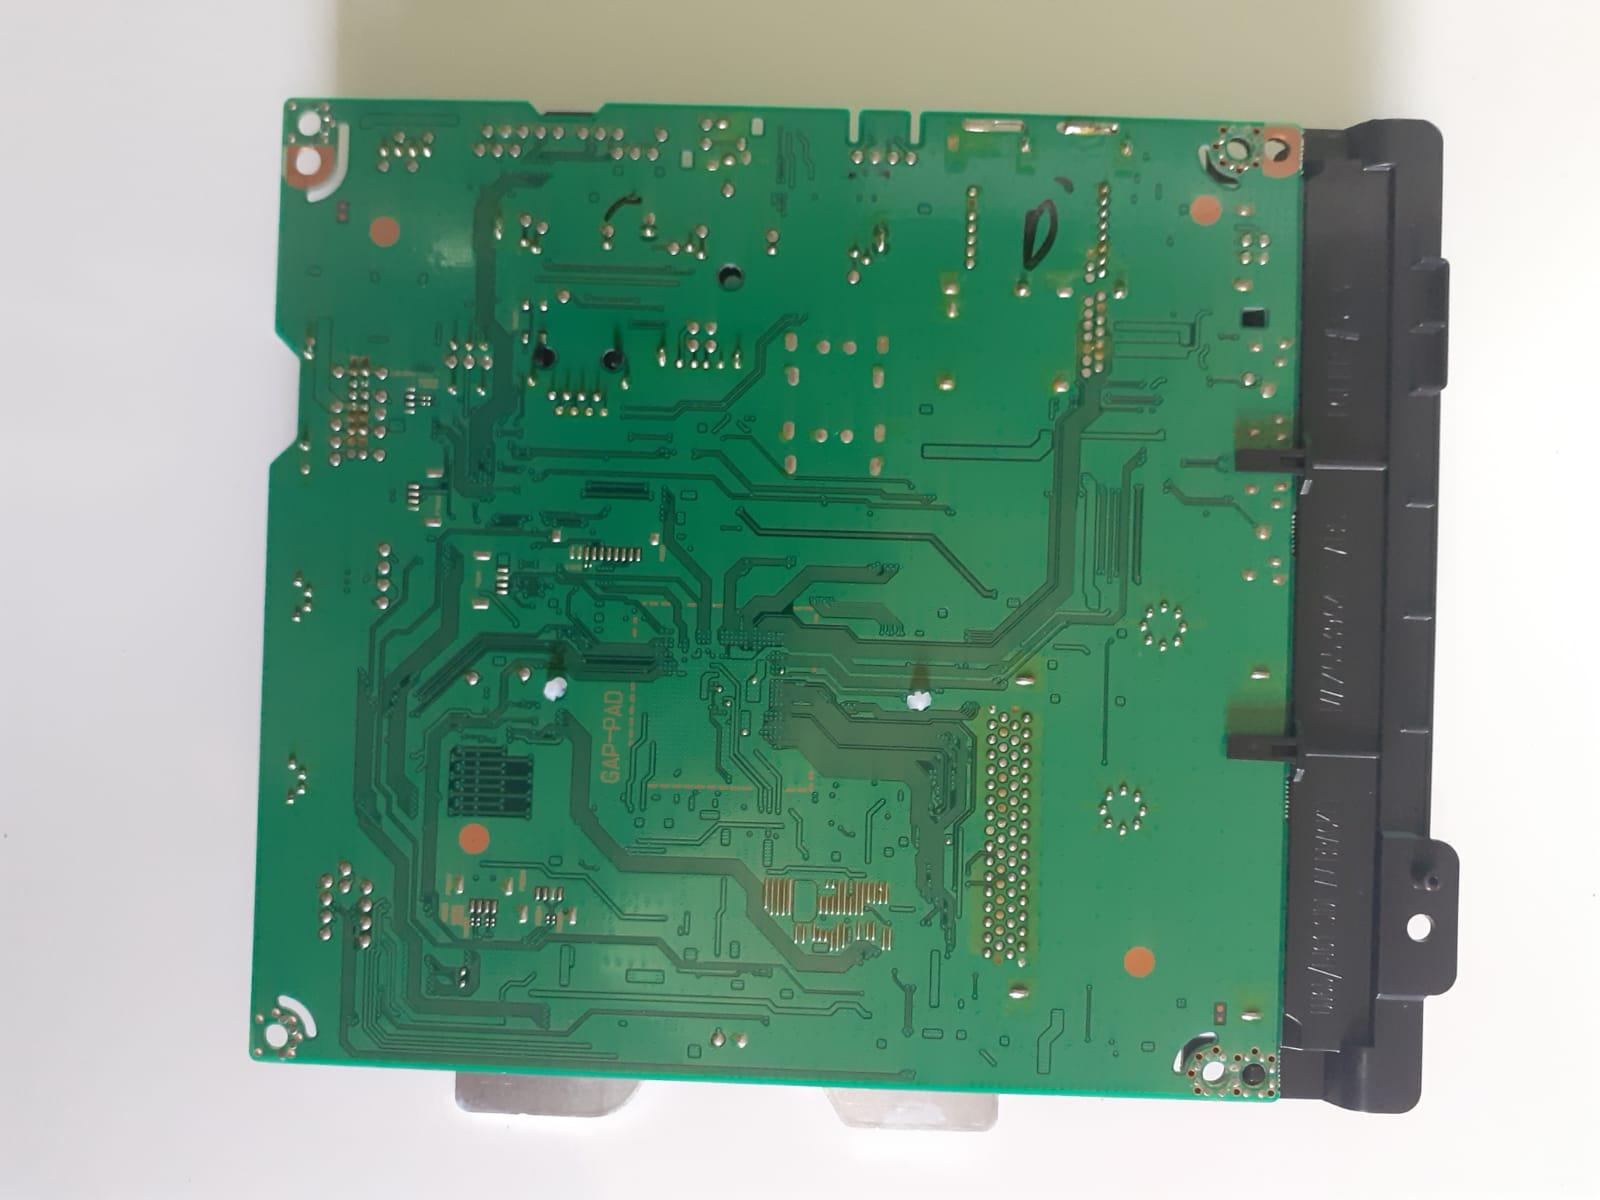 Placa Principal EAX67872804(1.0) UK75LM18AMGJ658835 01 para TV LG 50UK6510, 43UK6510 e 43UK6520